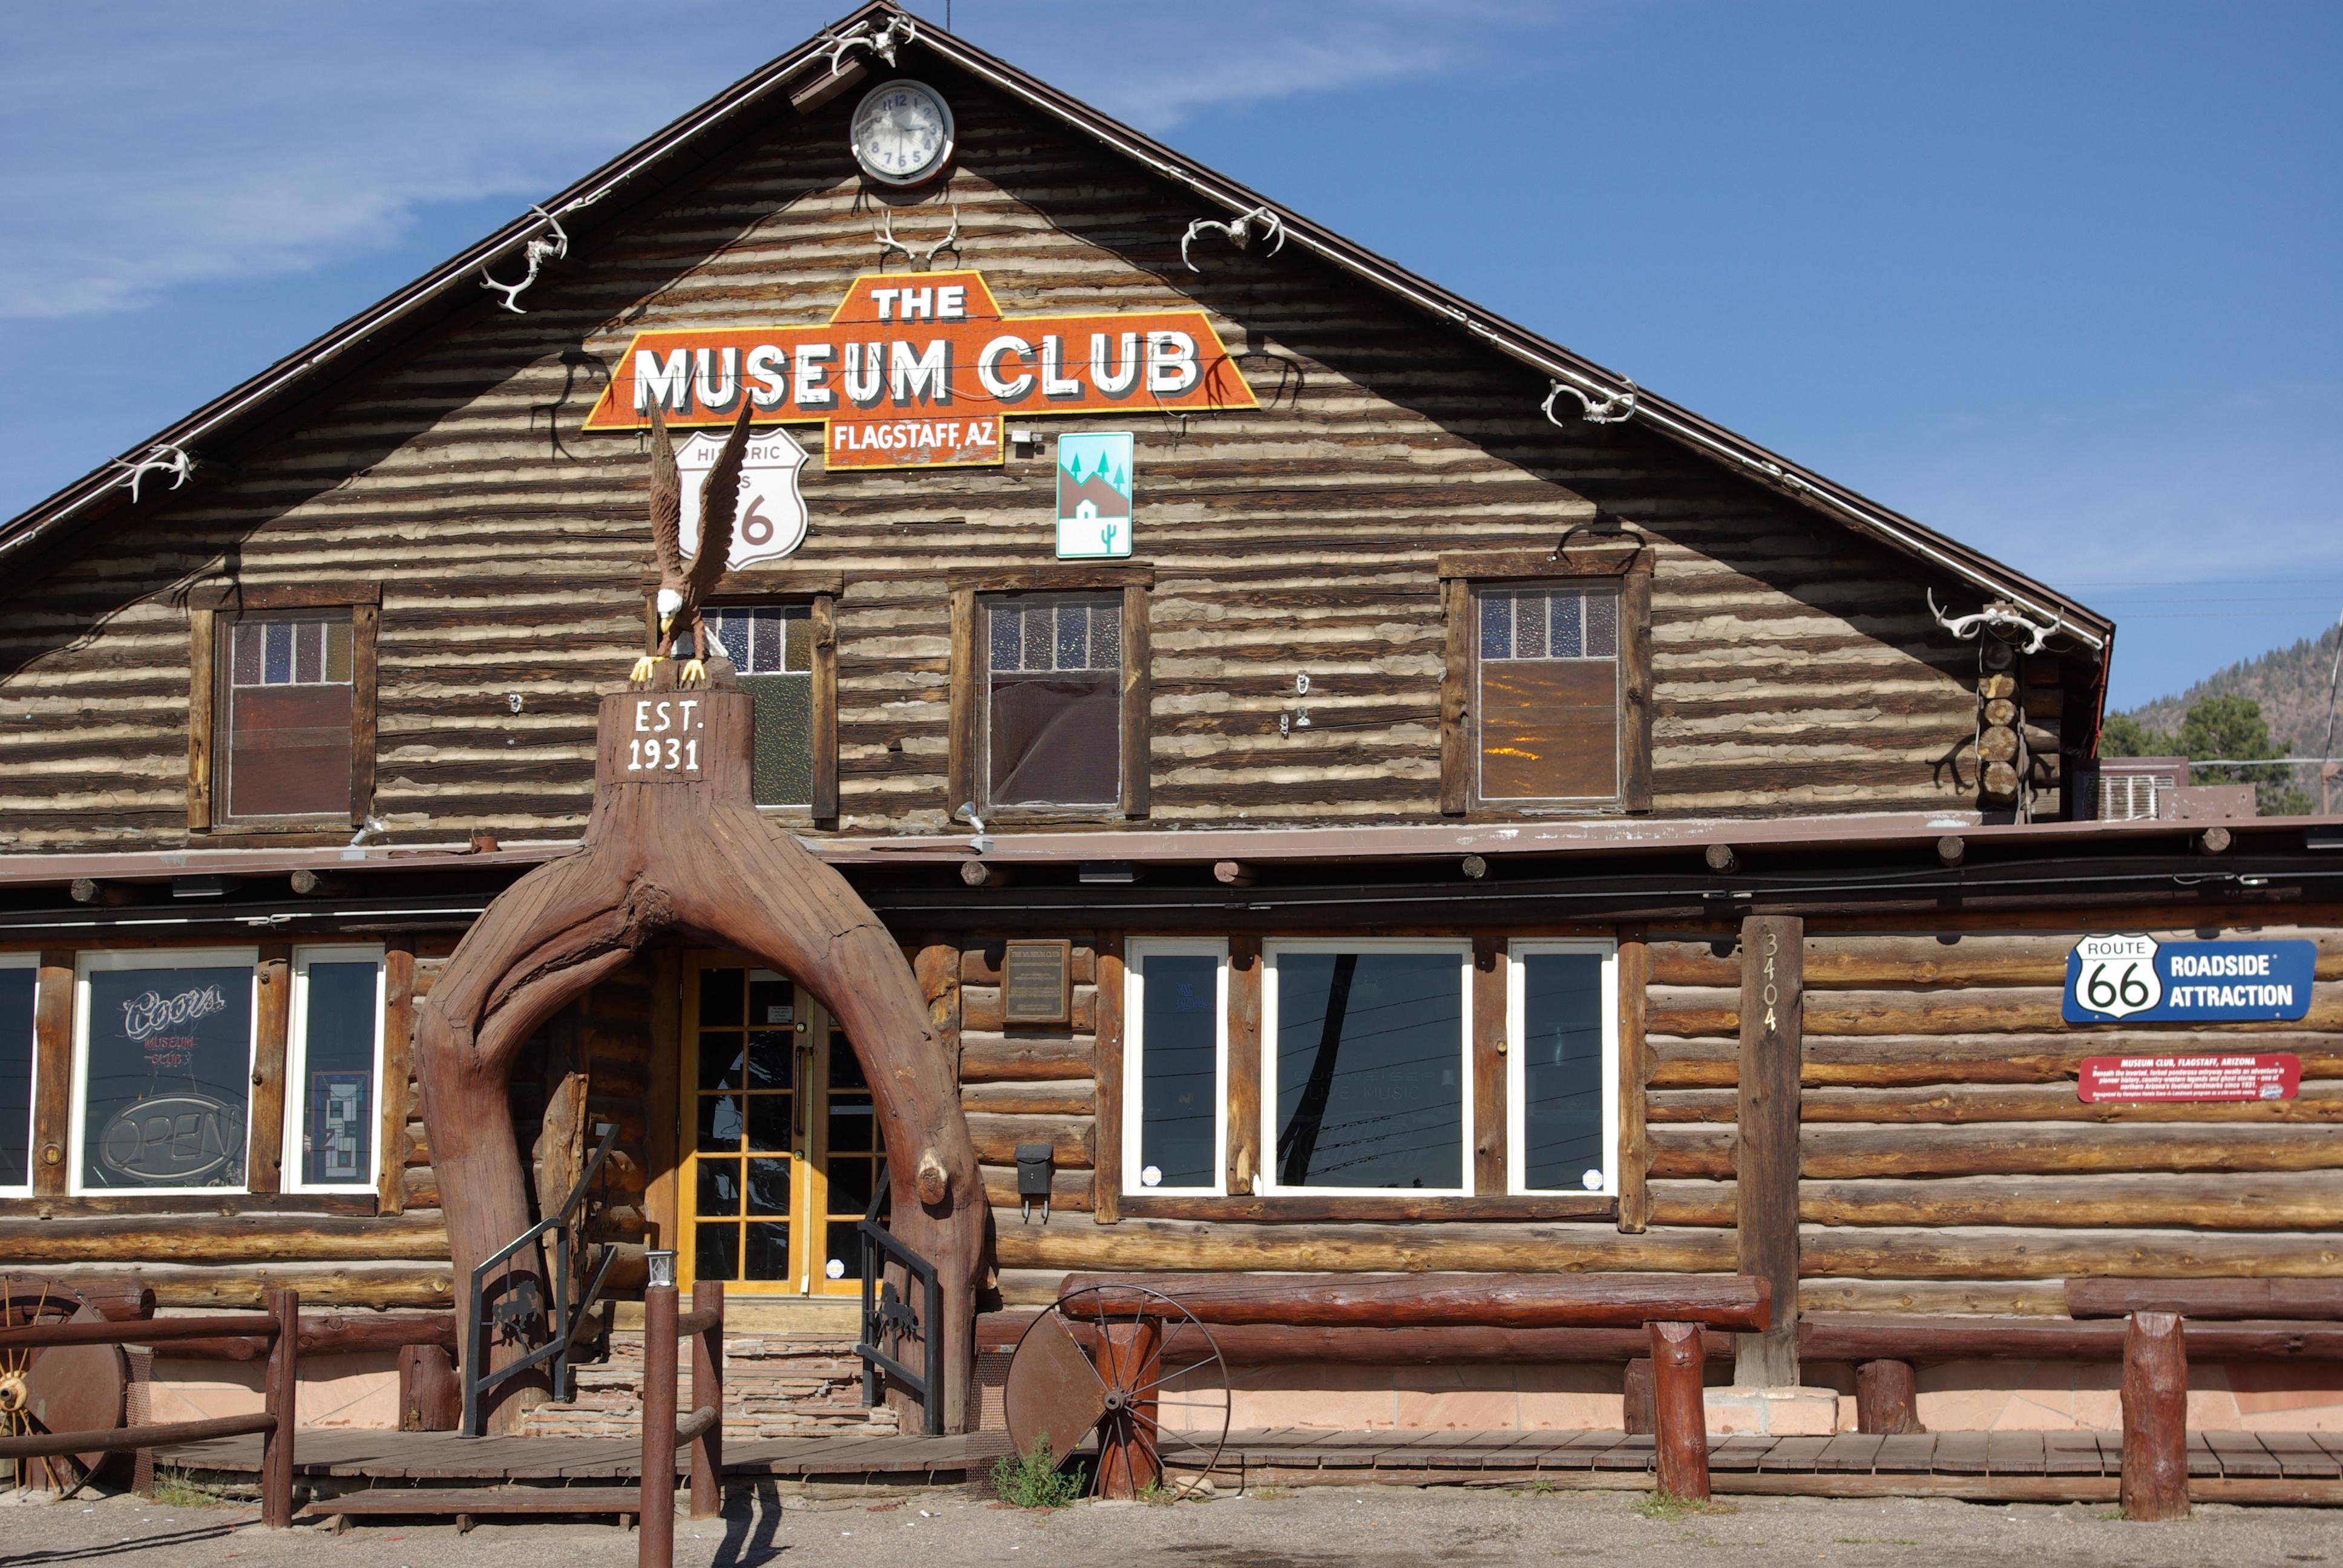 Museum Club Route 66 Flagstaff Az Flickr Photo Sharing